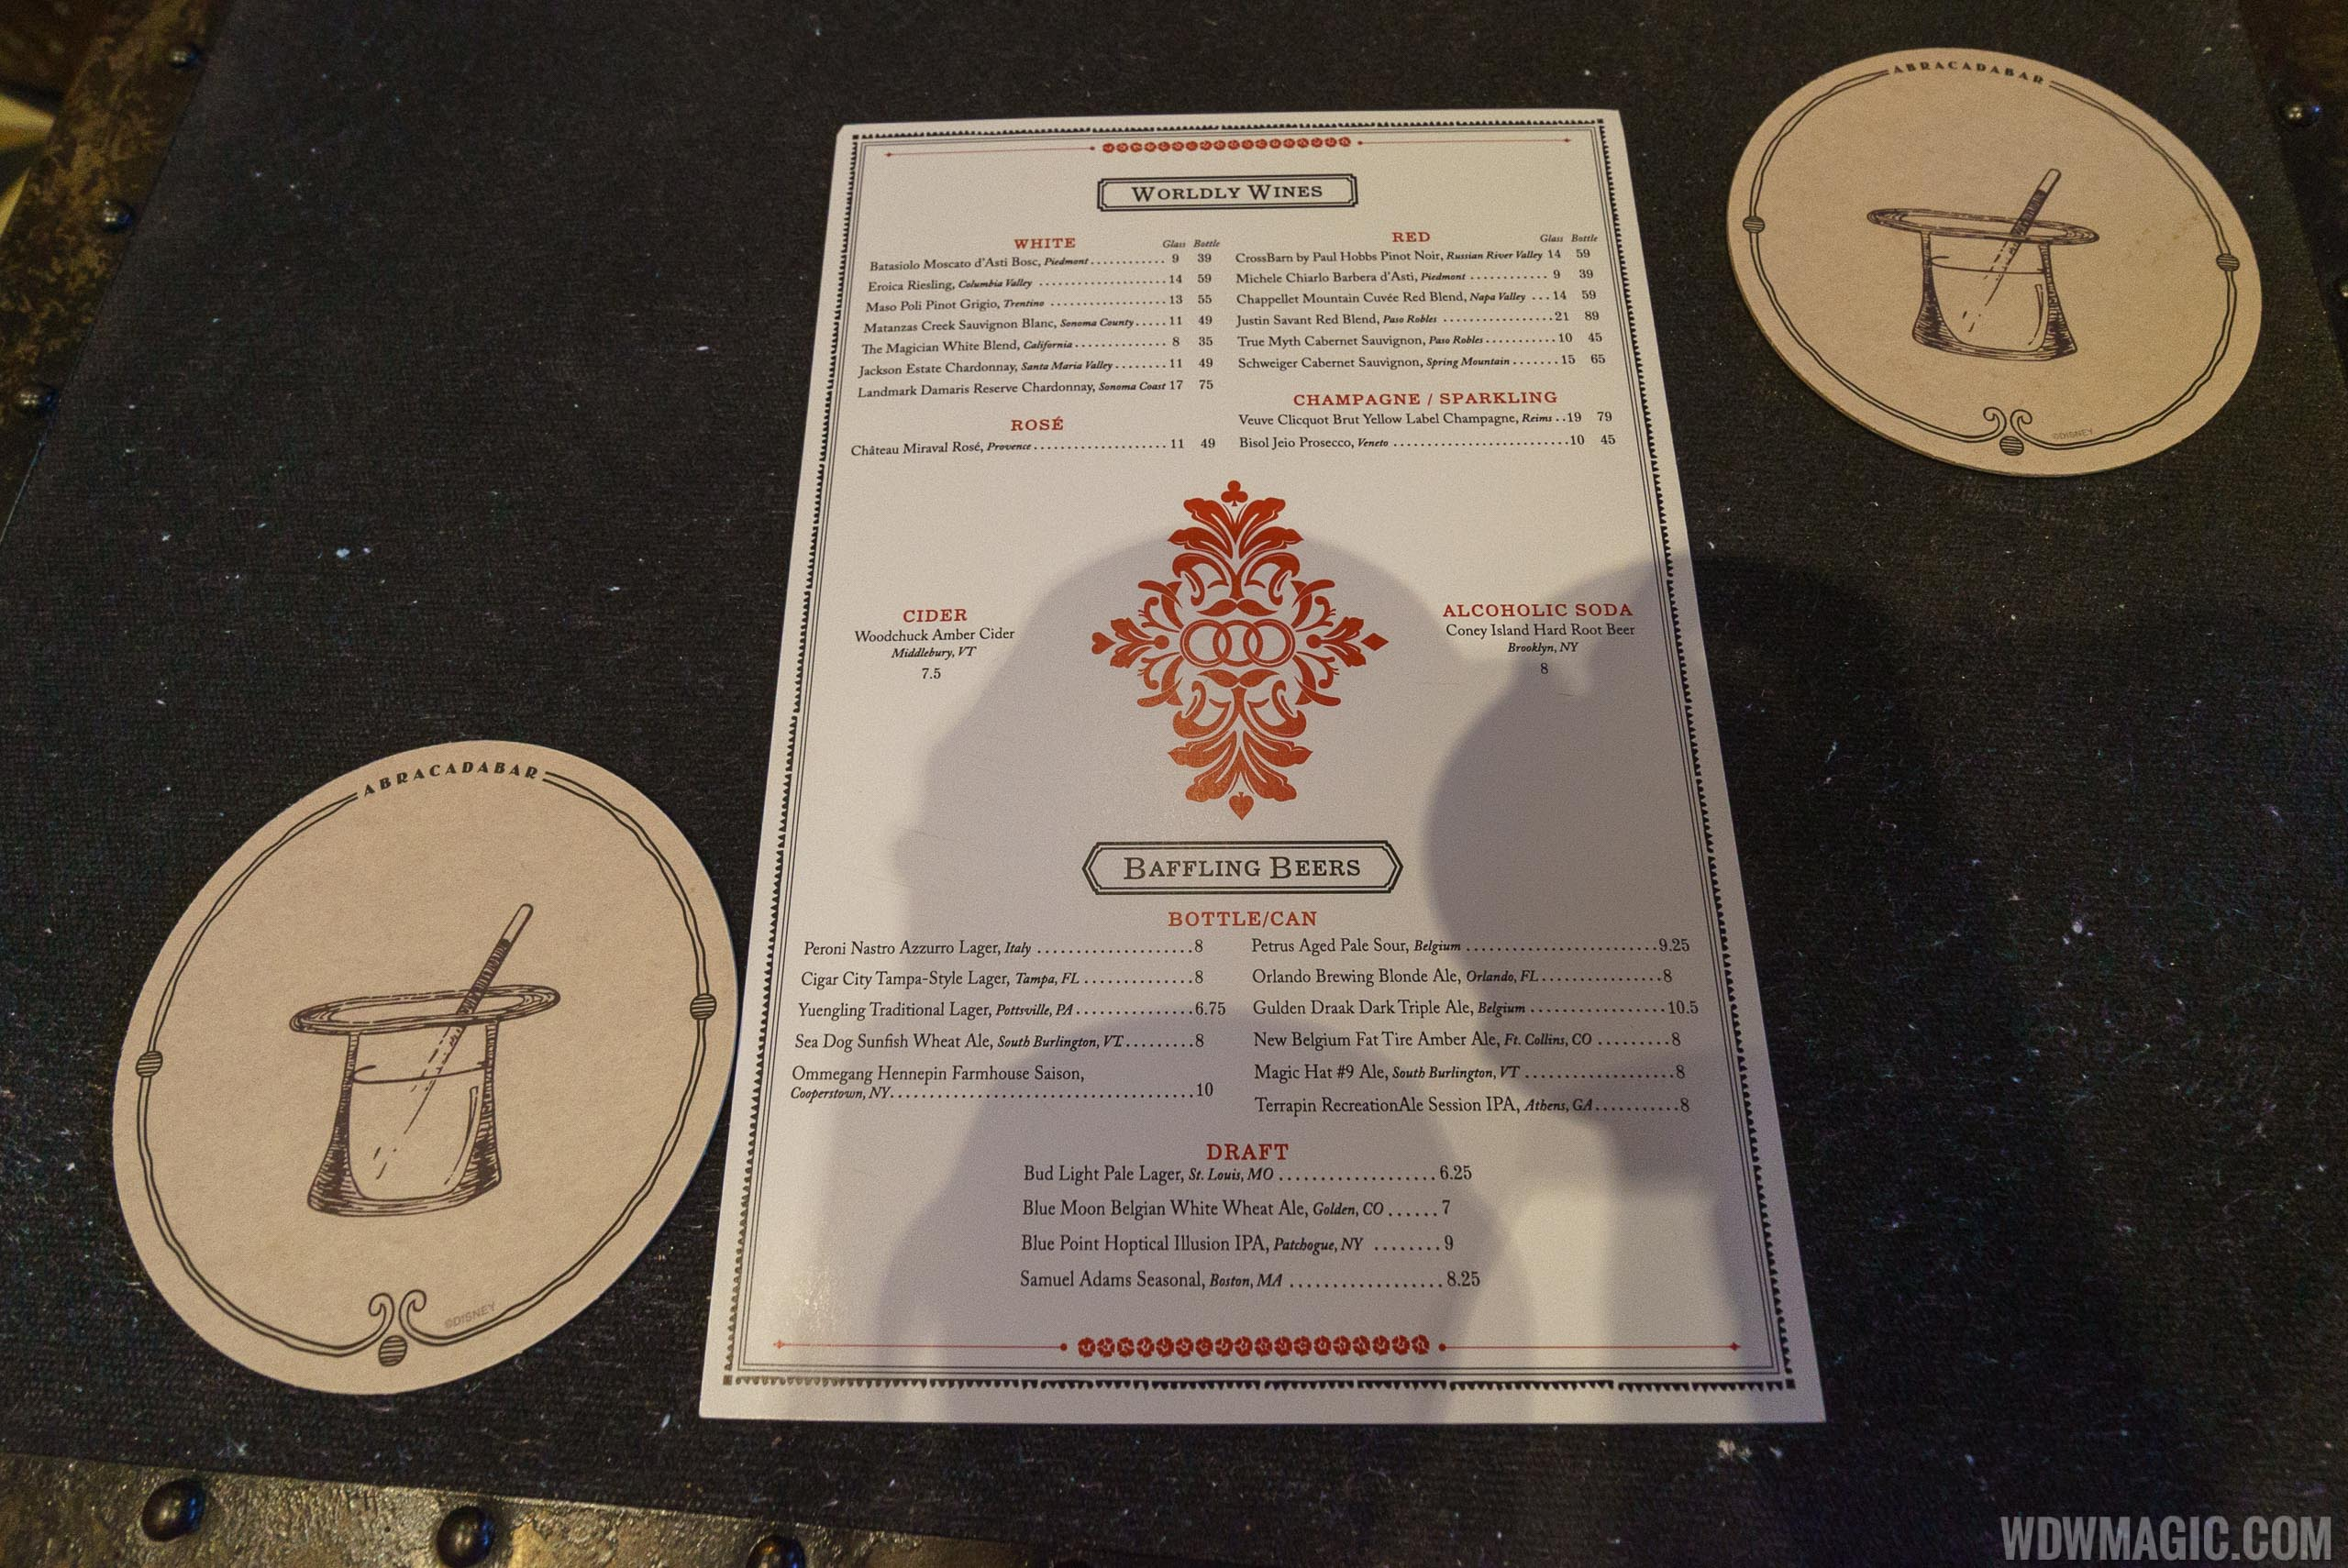 AbracadaBAR Wine and Beer menu